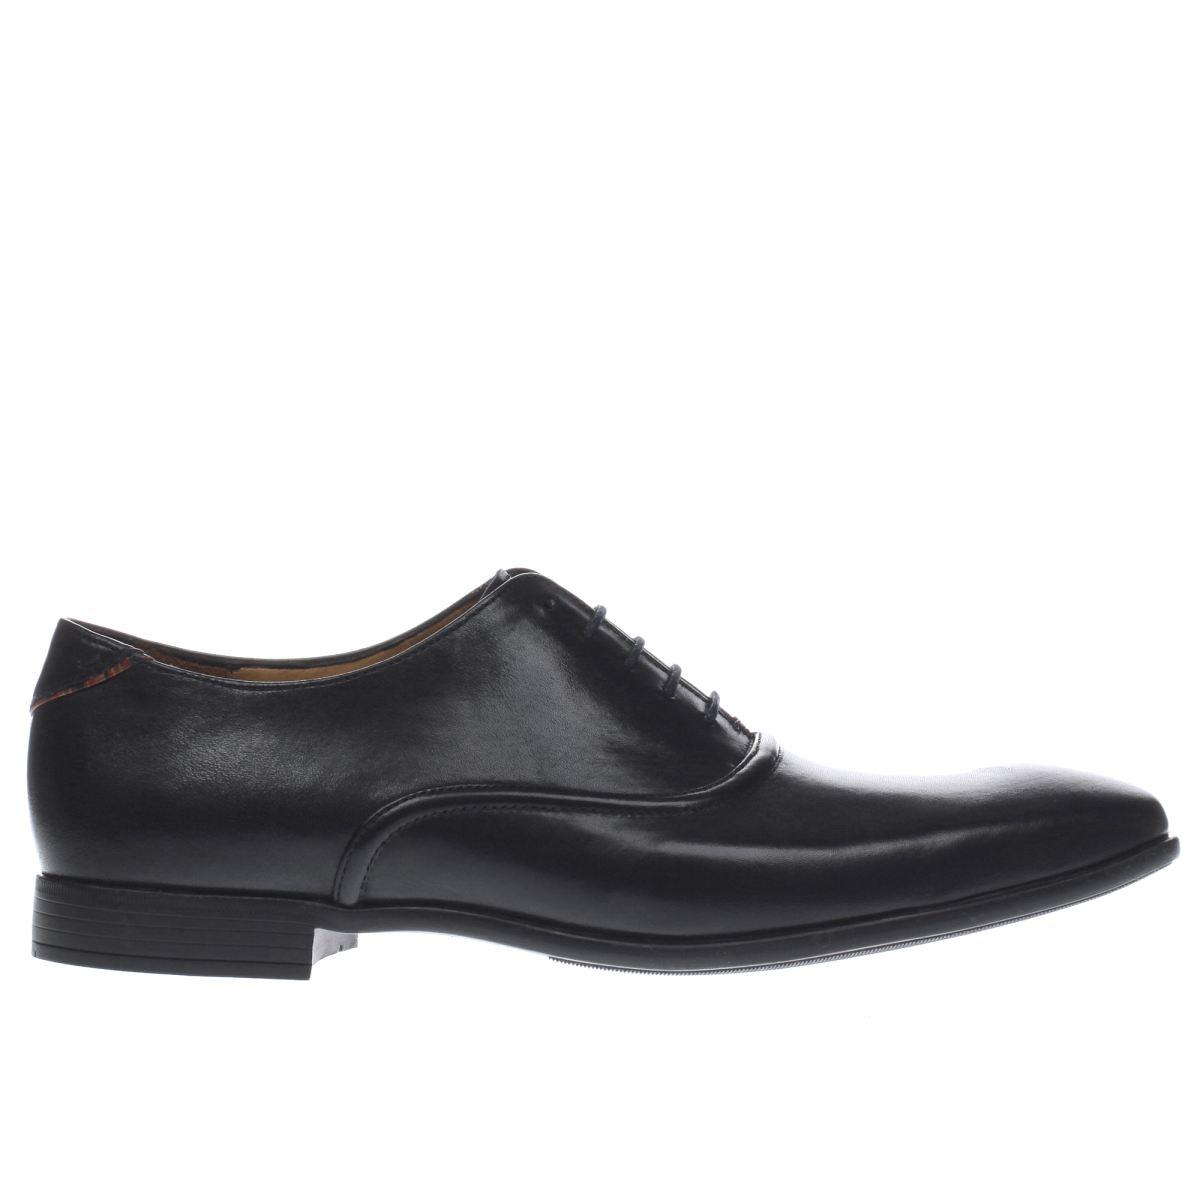 paul smith shoe ps Paul Smith Shoe Ps Black Starling Shoes